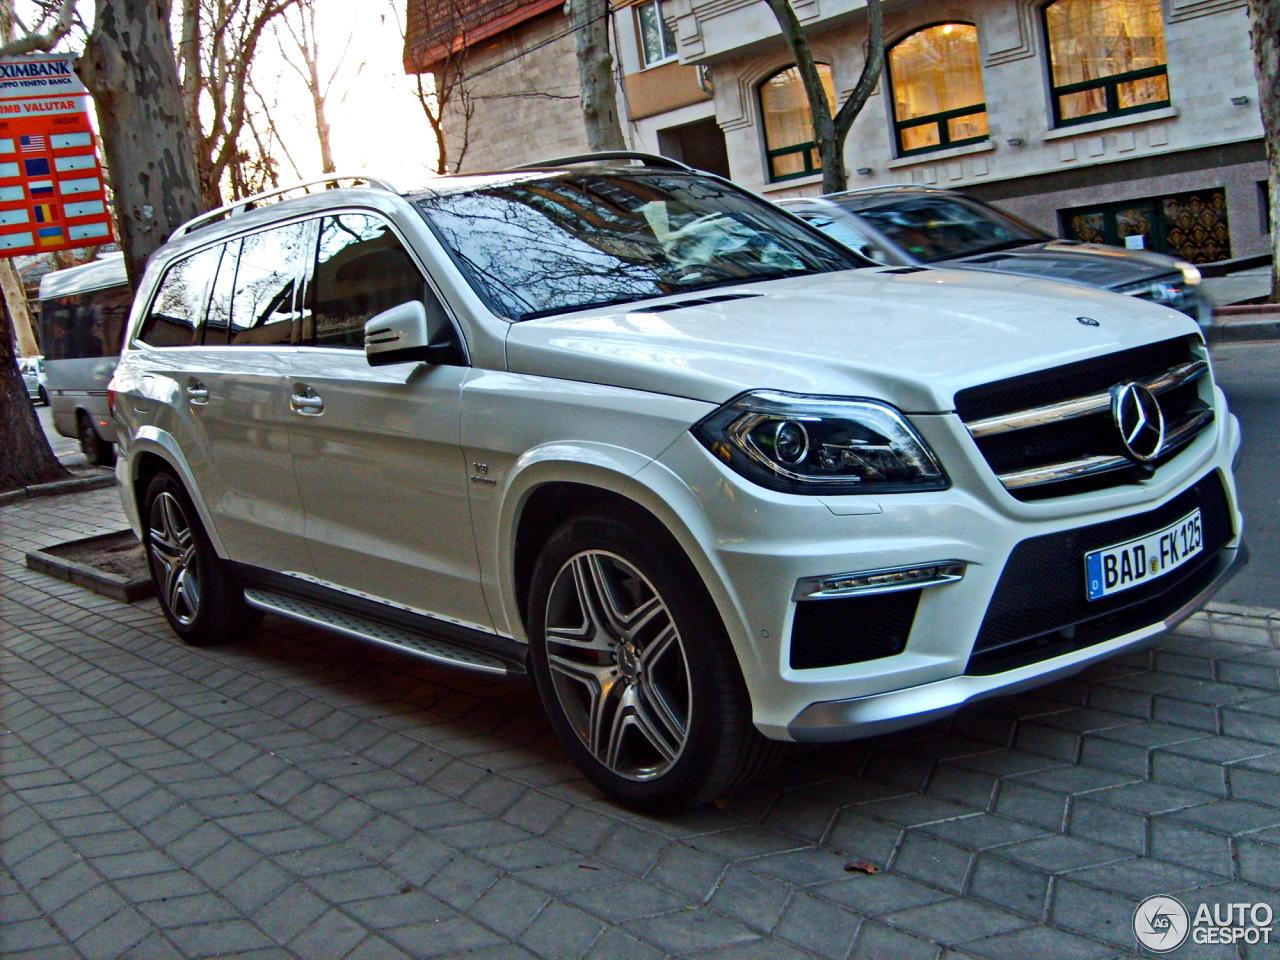 Mercedes benz gl 63 amg x166 25 march 2014 autogespot for Mercedes benz gls 2014